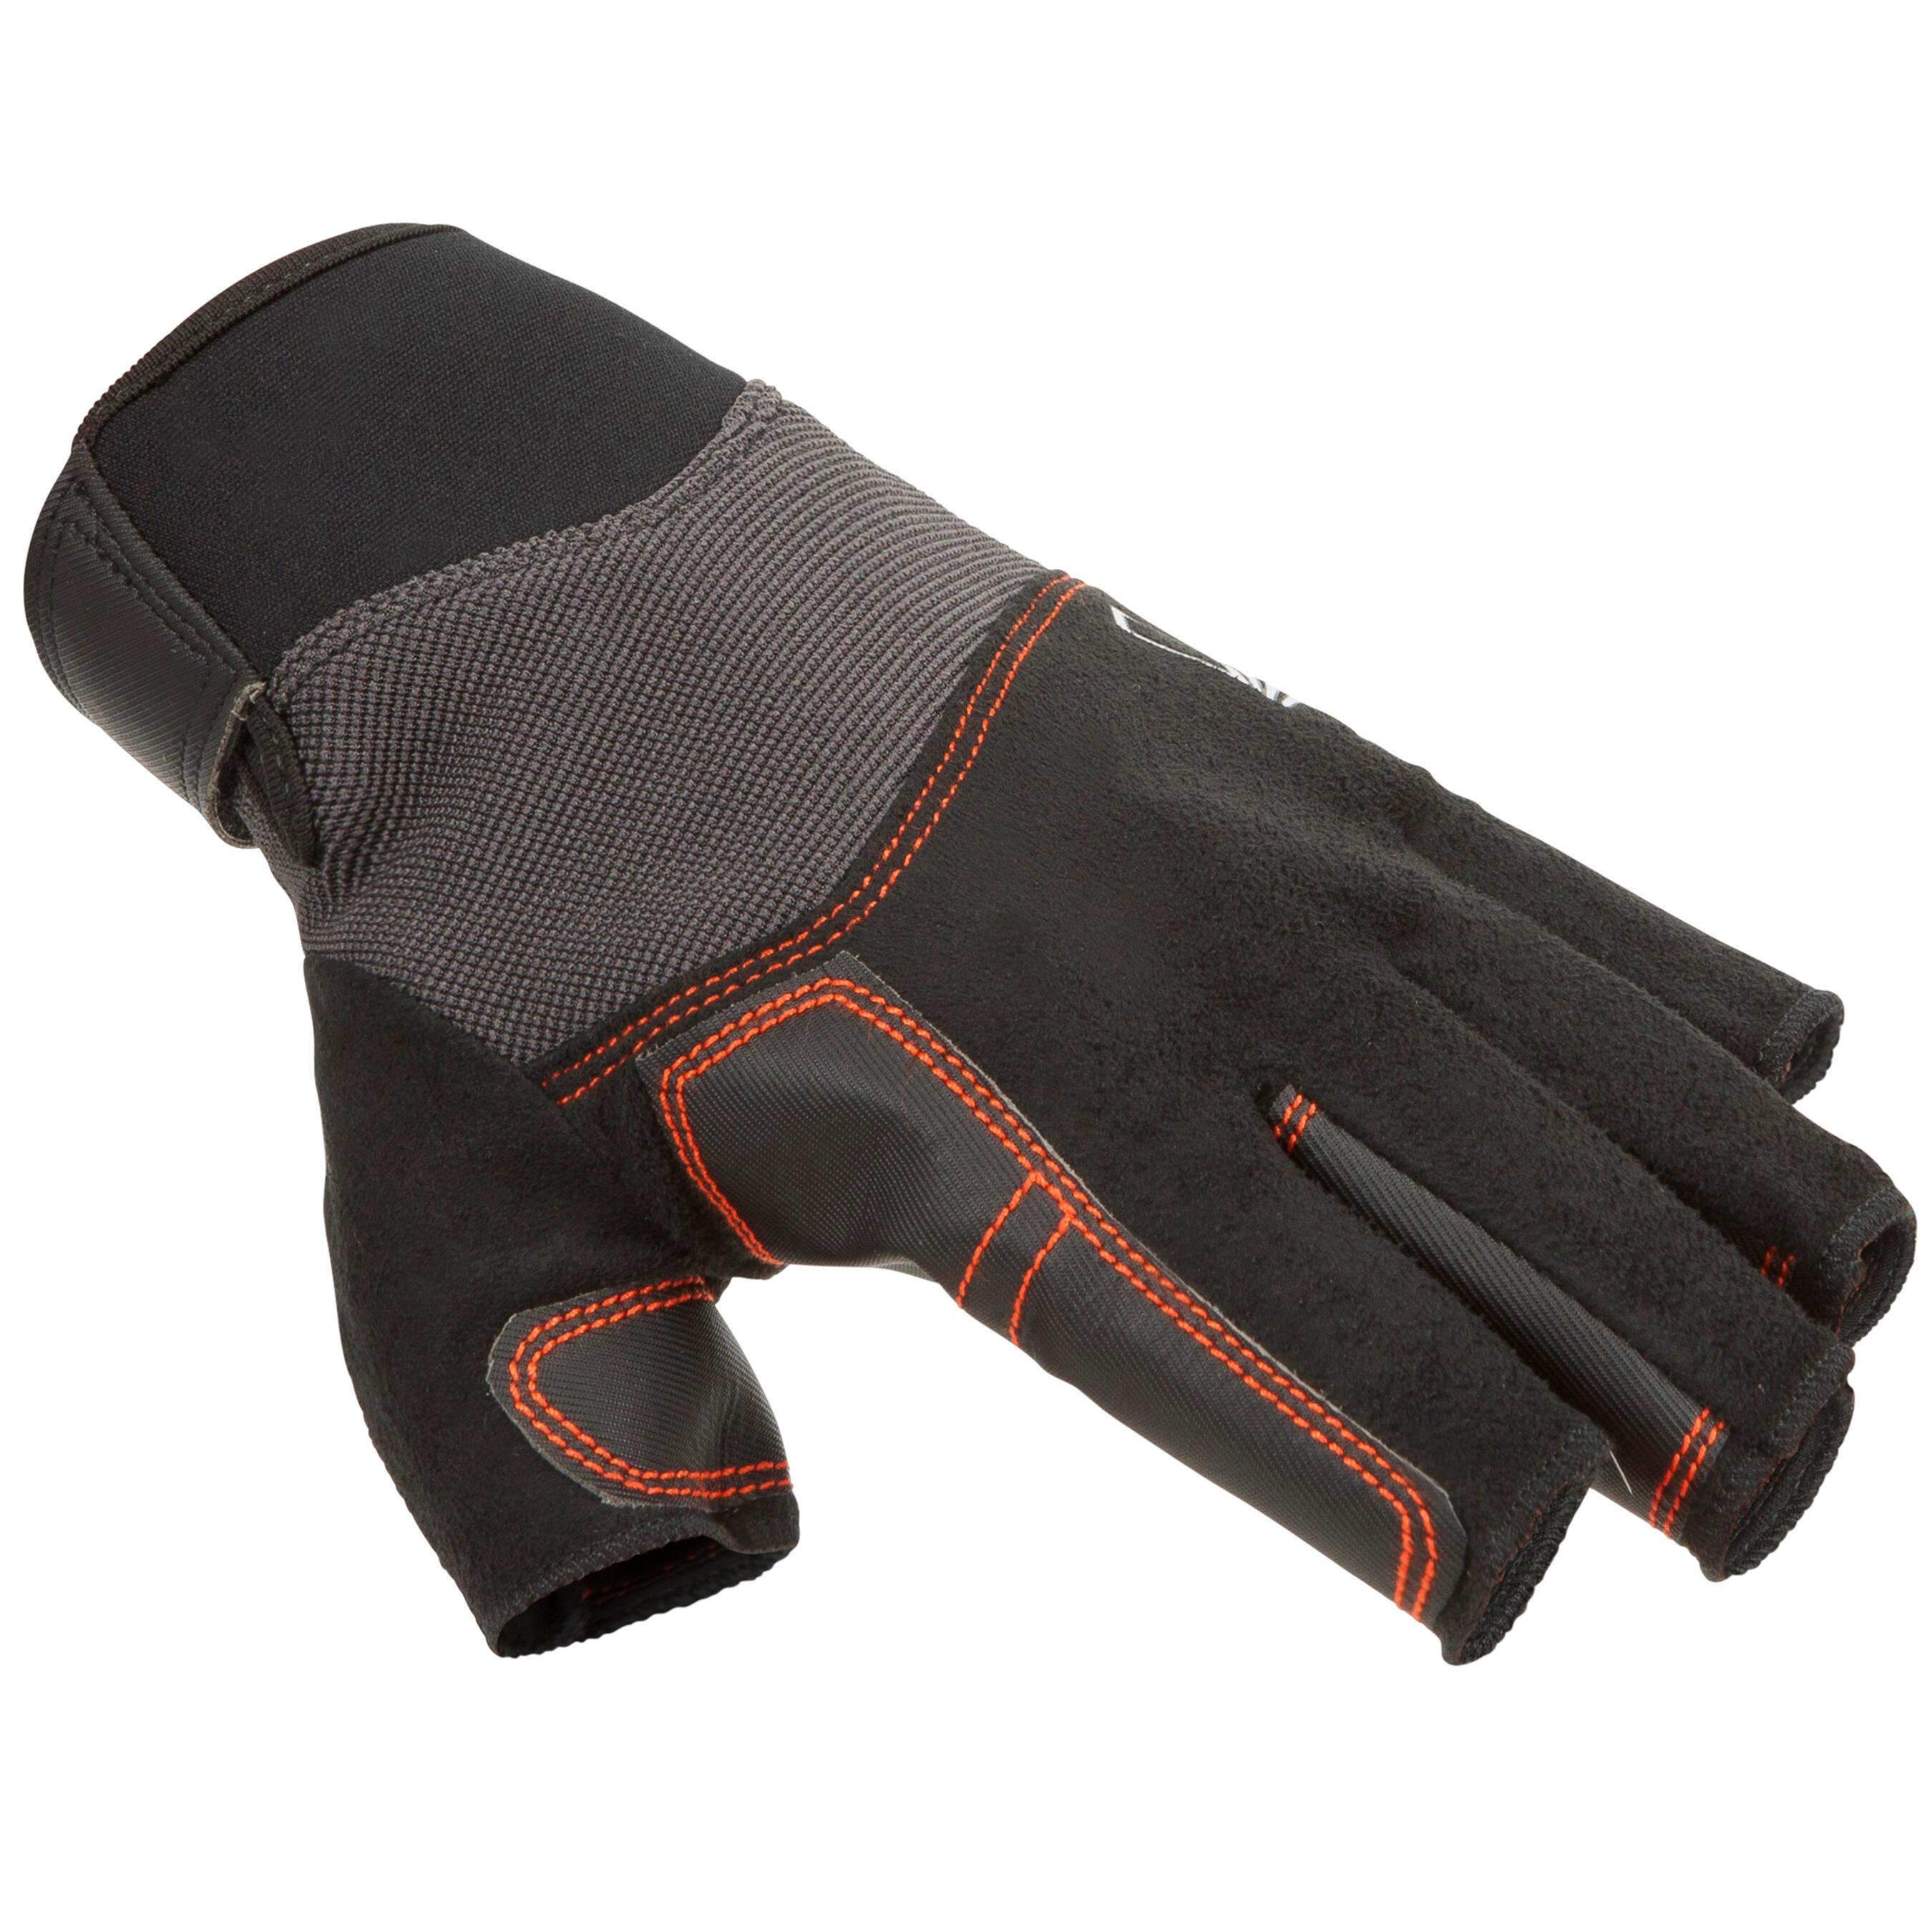 Segel-Handschuhe halbhand Sailing 500 Damen schwarz   Accessoires > Handschuhe > Sonstige Handschuhe   Tribord